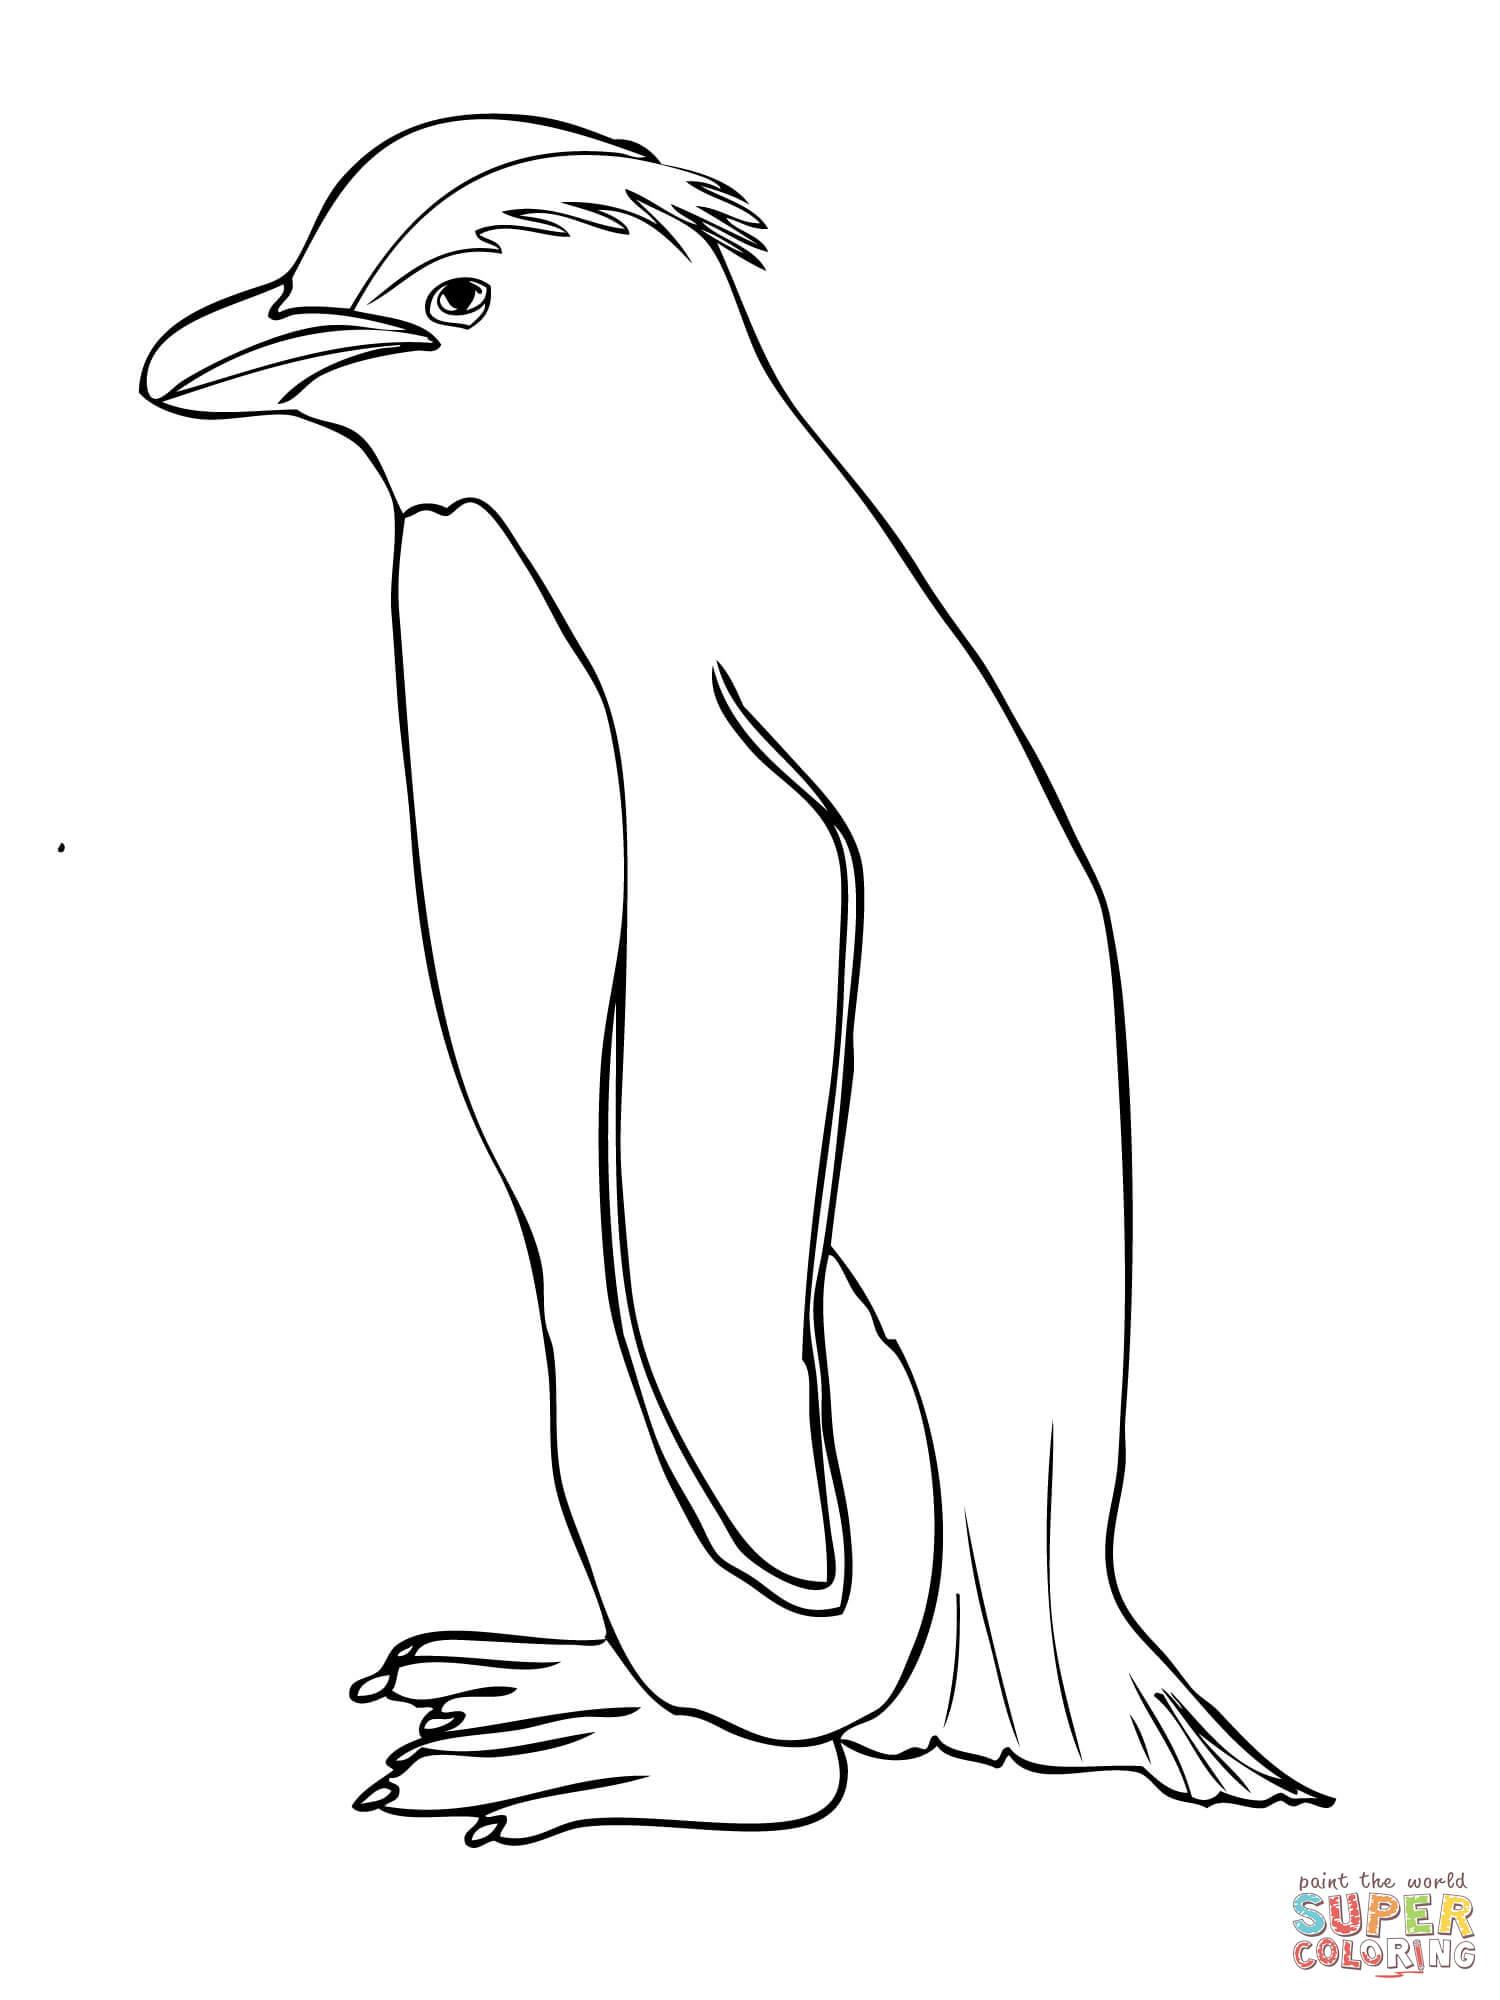 club penguin coloring pages of rockhopper exploration | Rockhopper Penguin coloring, Download Rockhopper Penguin ...